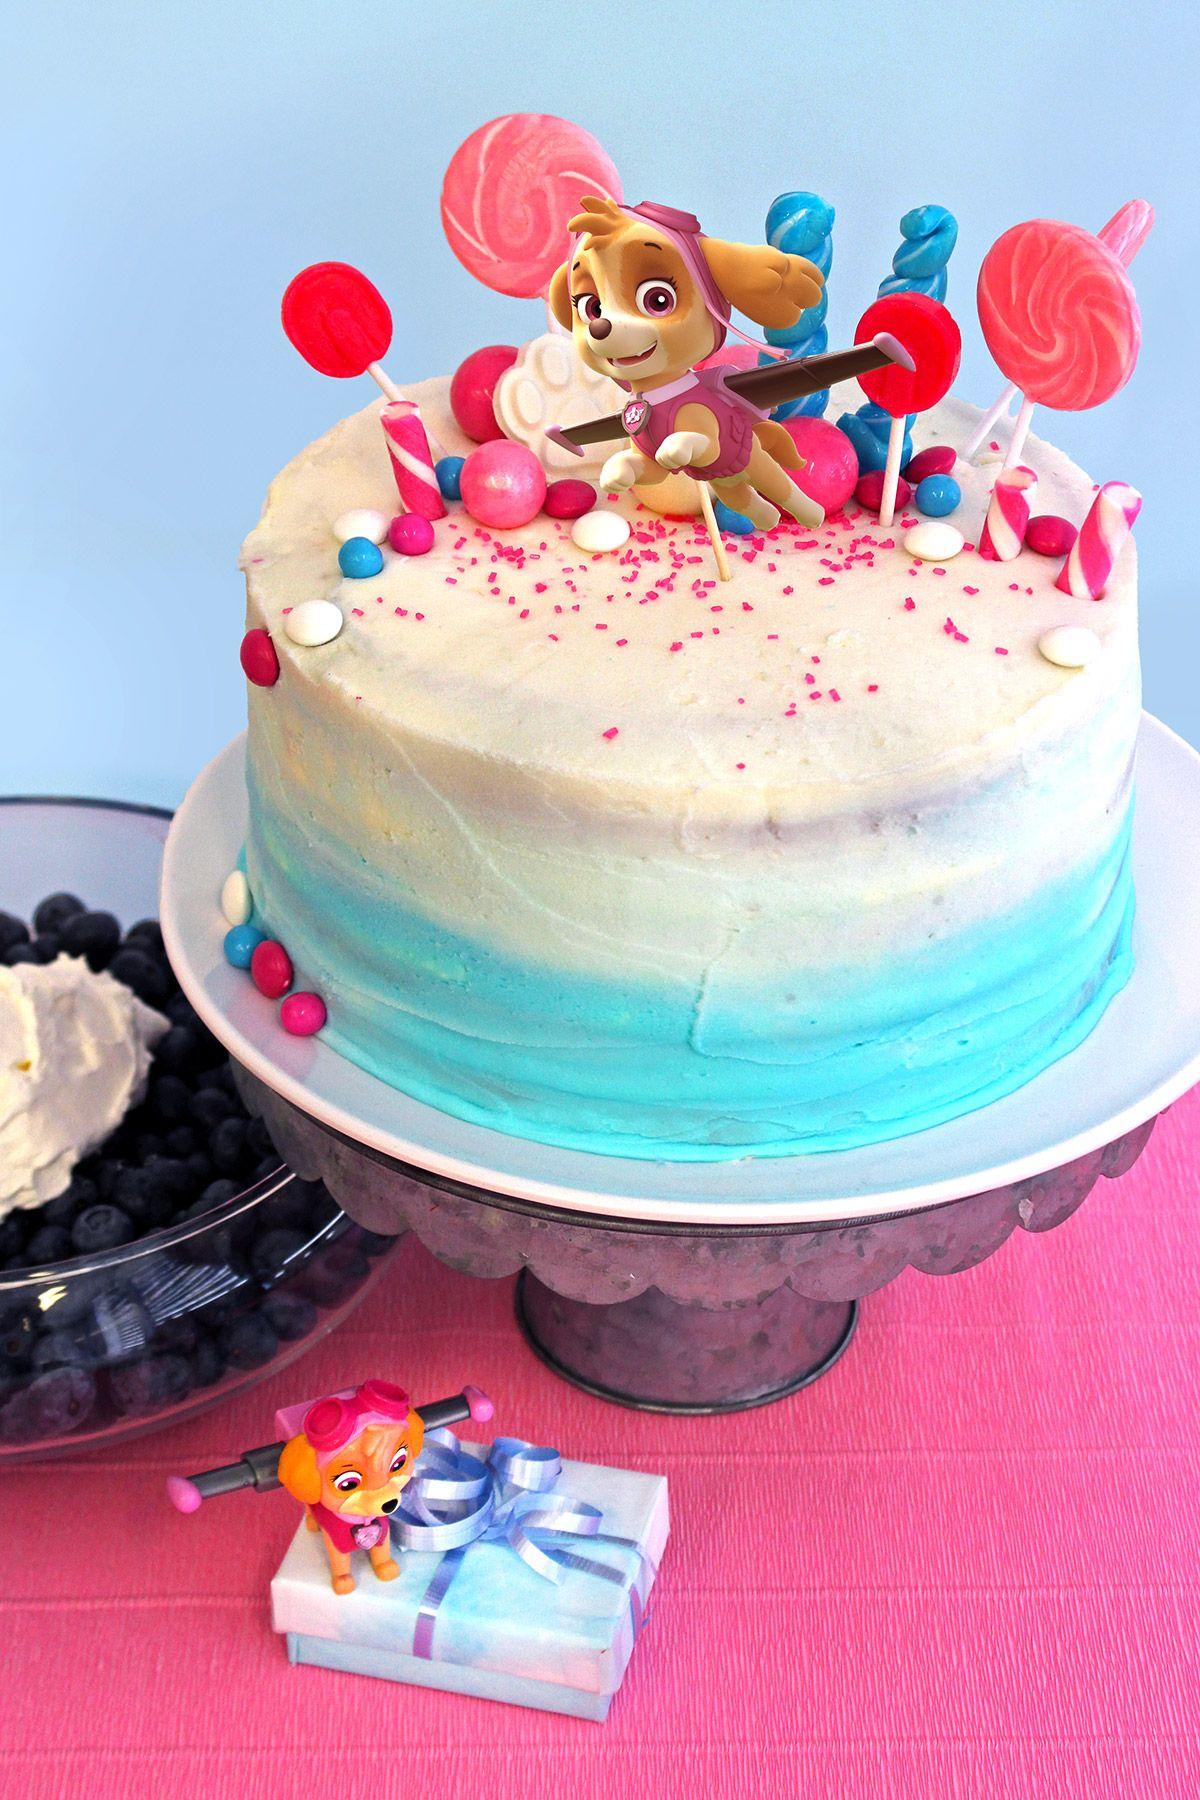 Paw patrol skye birthday cake topper torta paw patrol